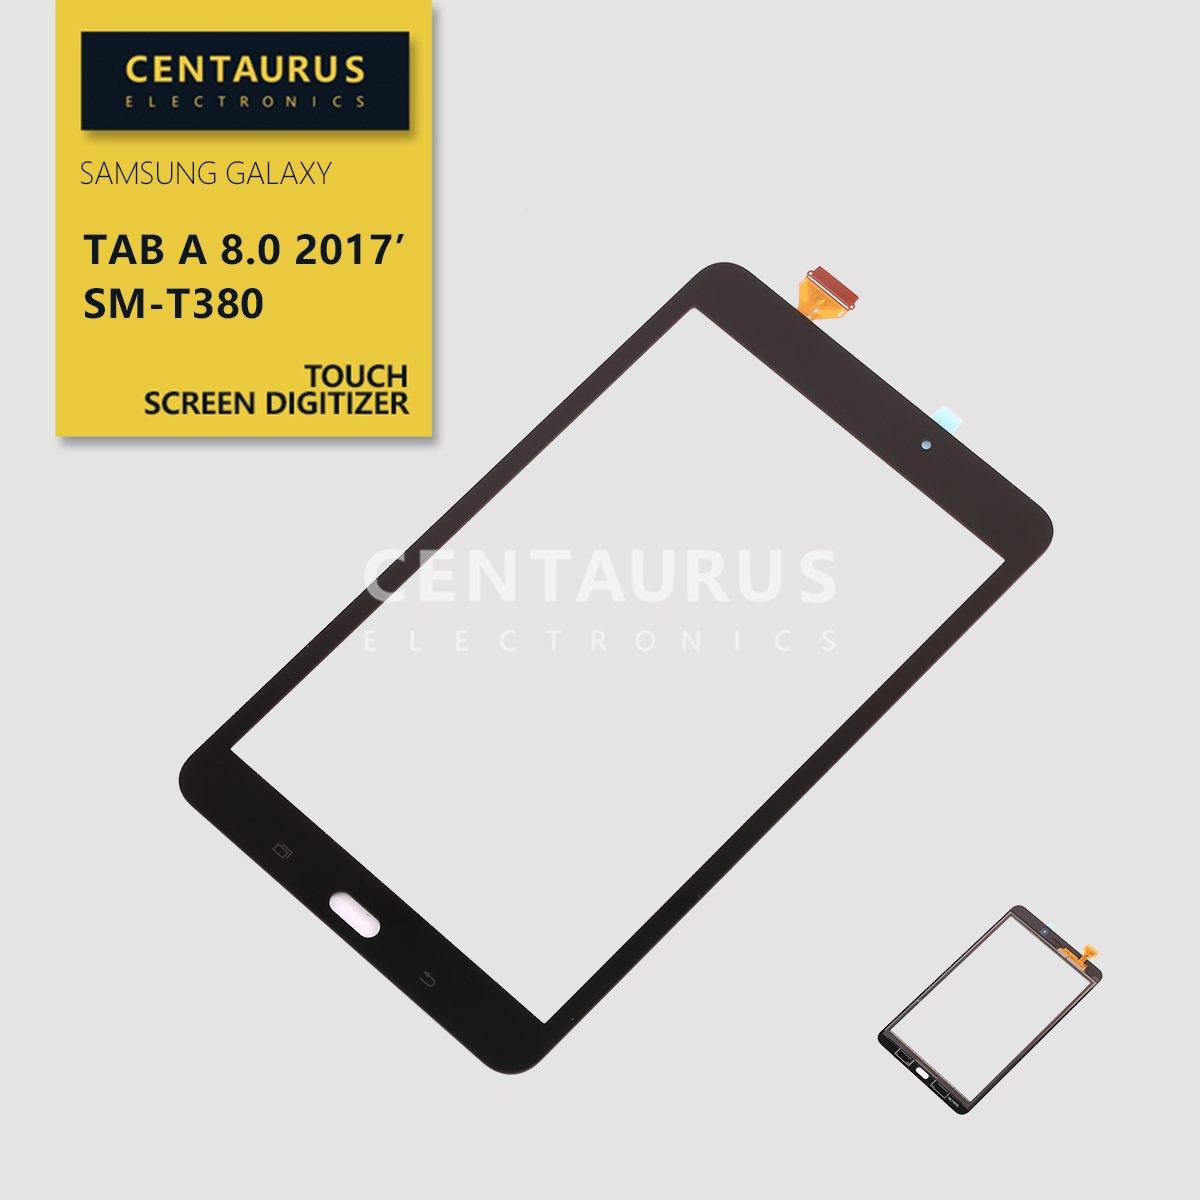 Reemplazo Pantalla P/ Samsung Galaxy Tab A 8.0 2017 Sm T380